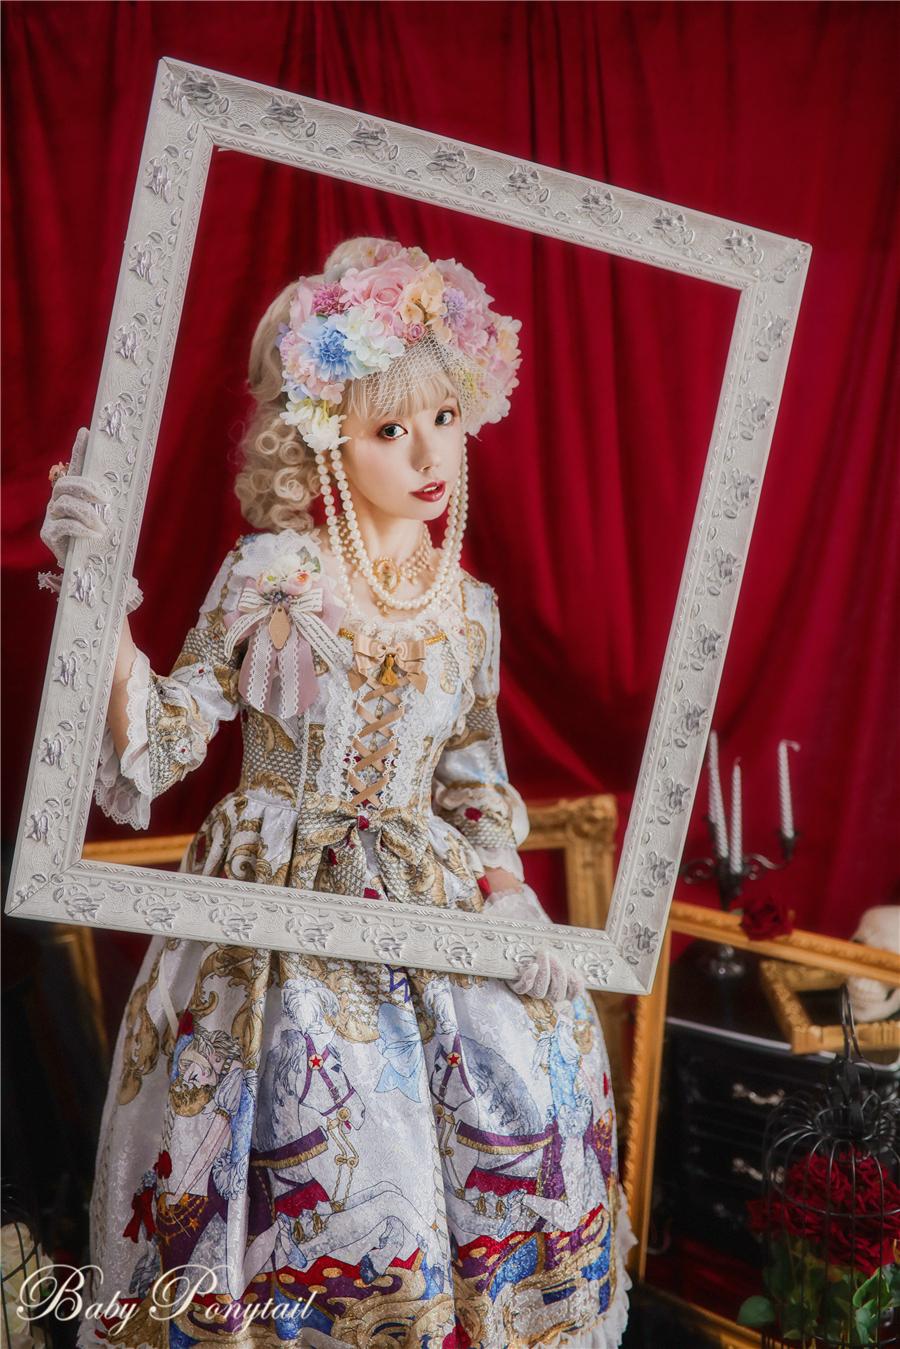 Baby Ponytail_Circus Princess_Silver OP_Kaka_18.jpg